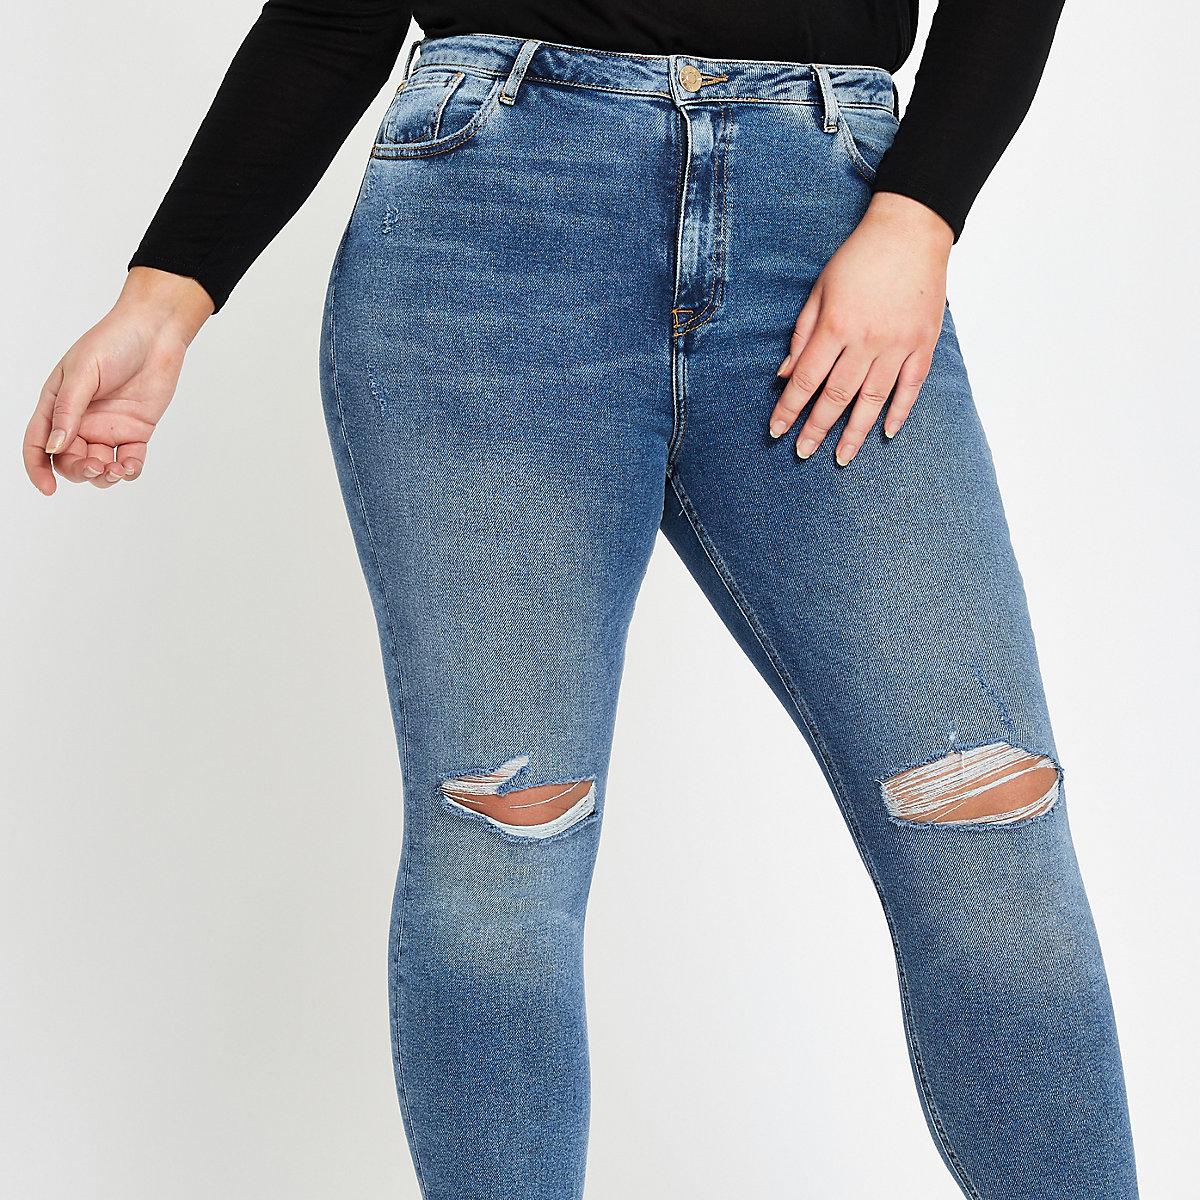 Plus blue Original mid rise skinny jeans - Skinny Jeans - Jeans - women 780eaa0c4f5be